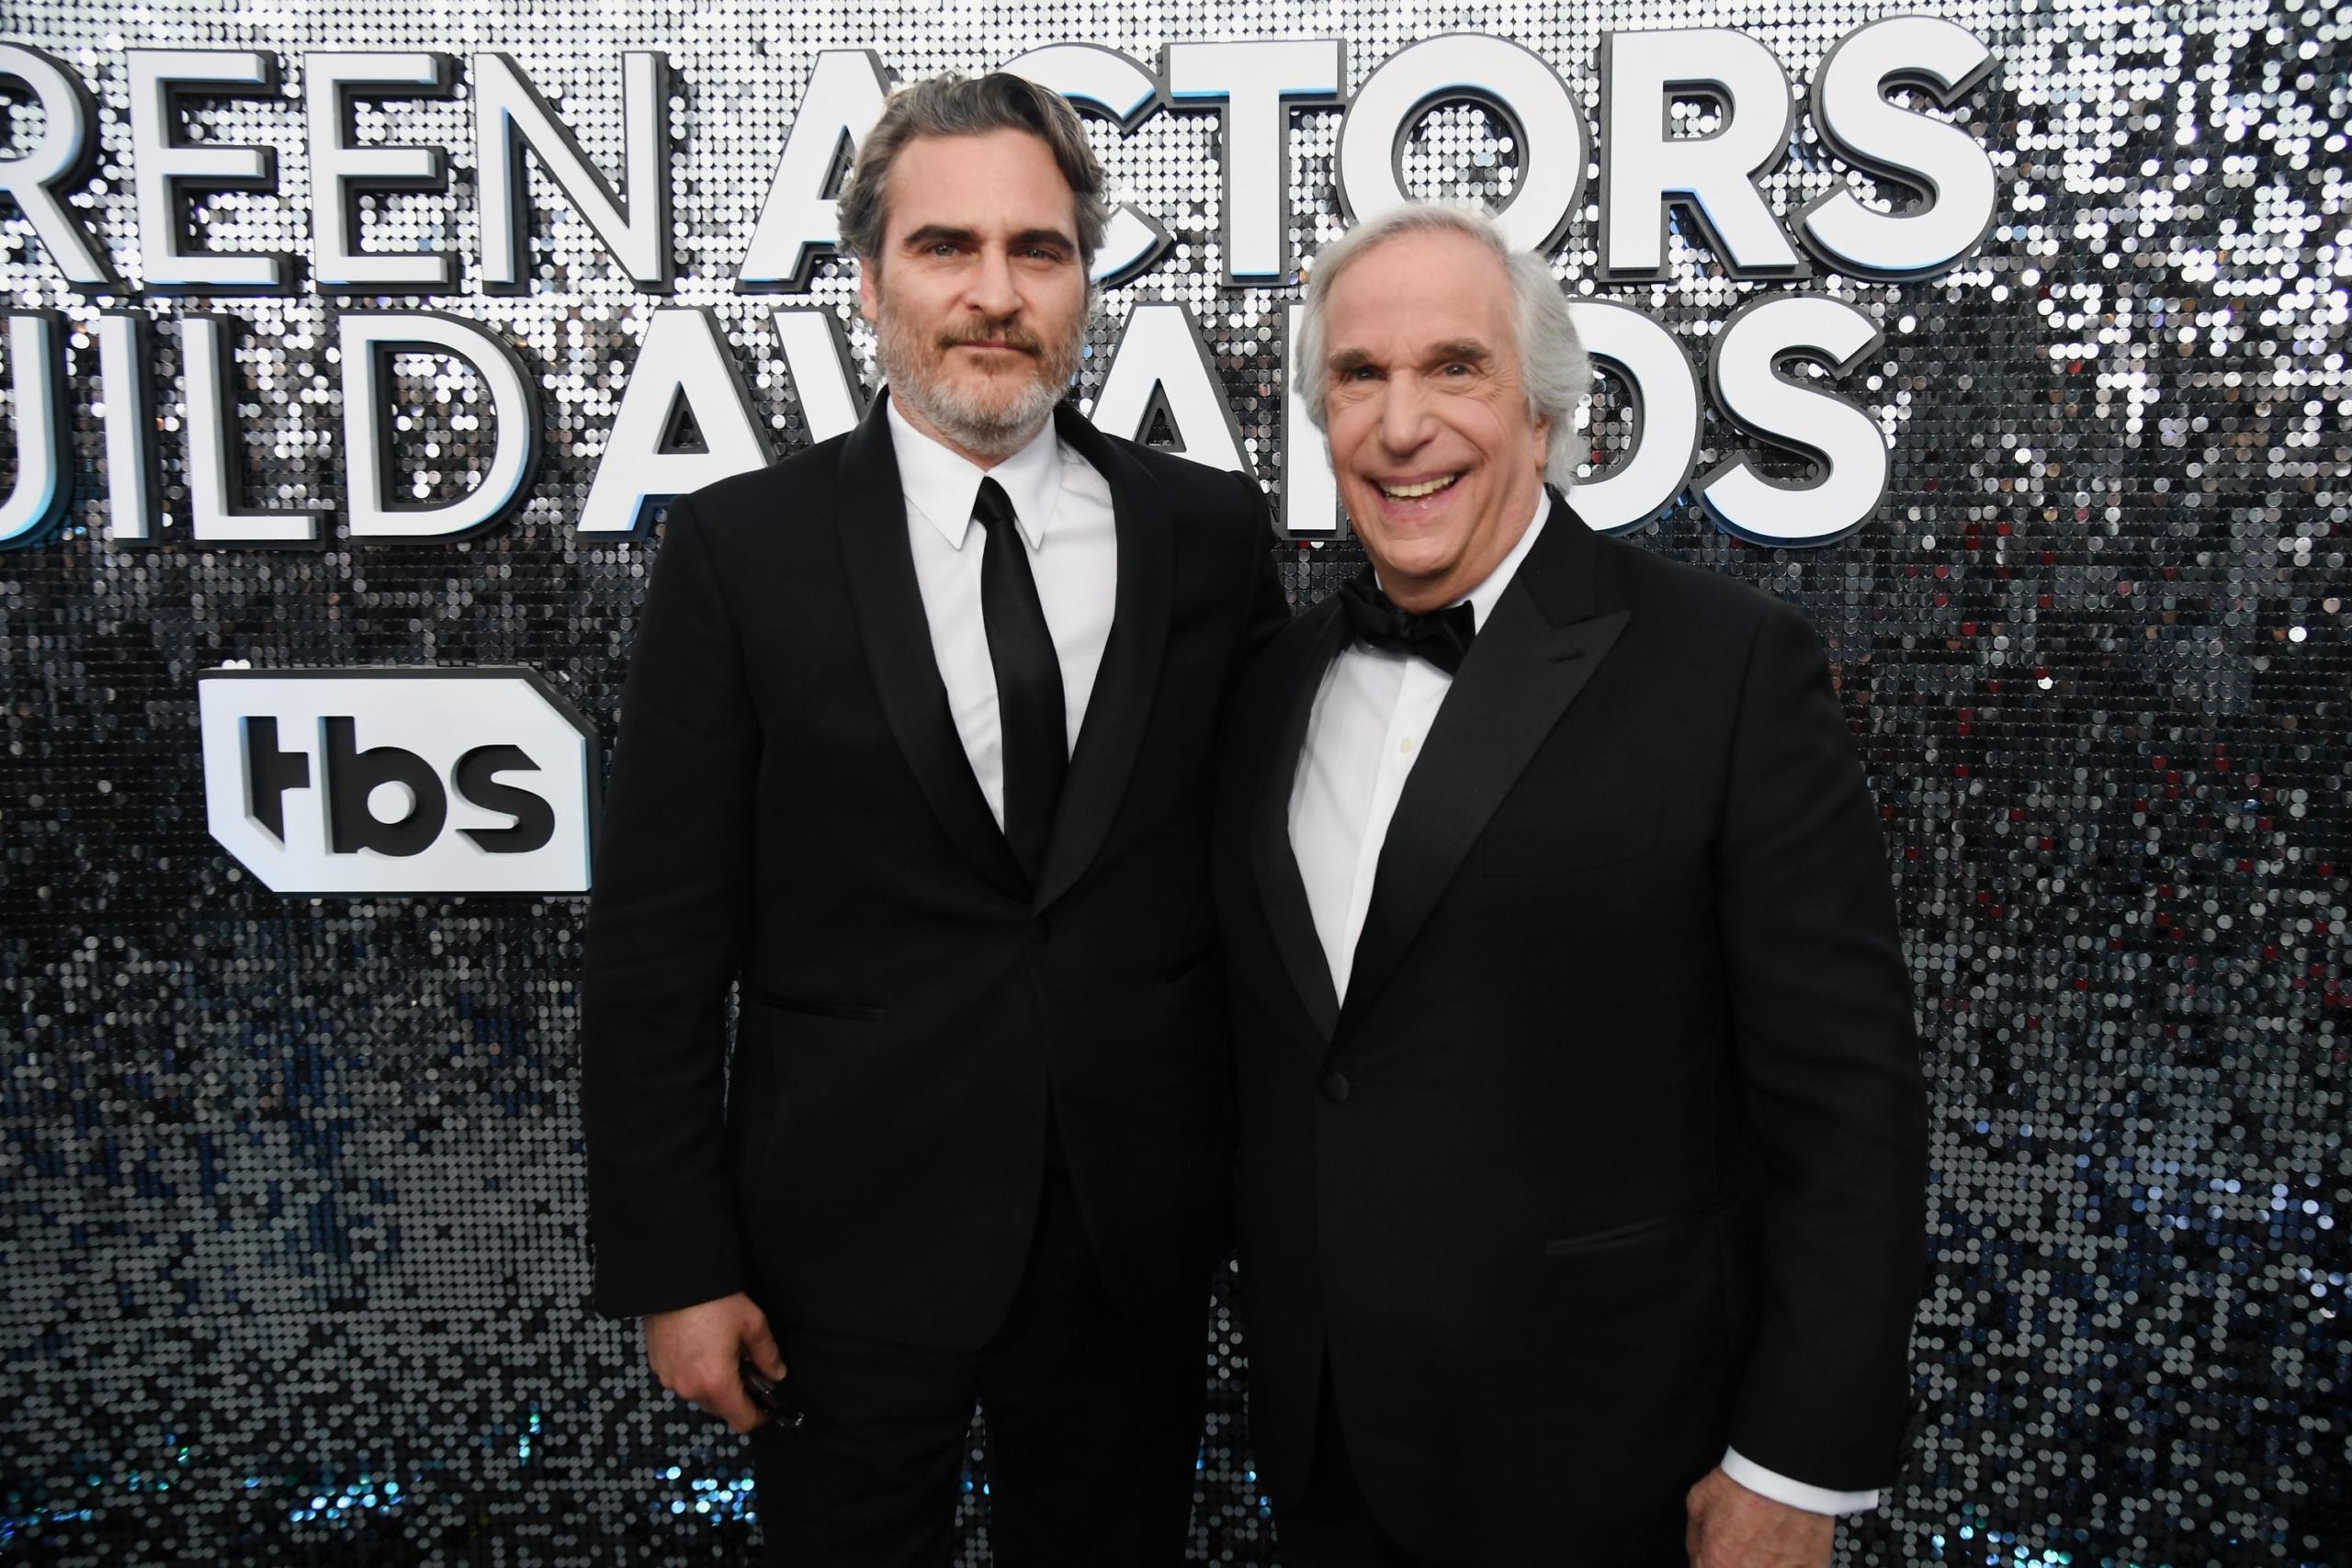 SAG Awards 2020 red carpet